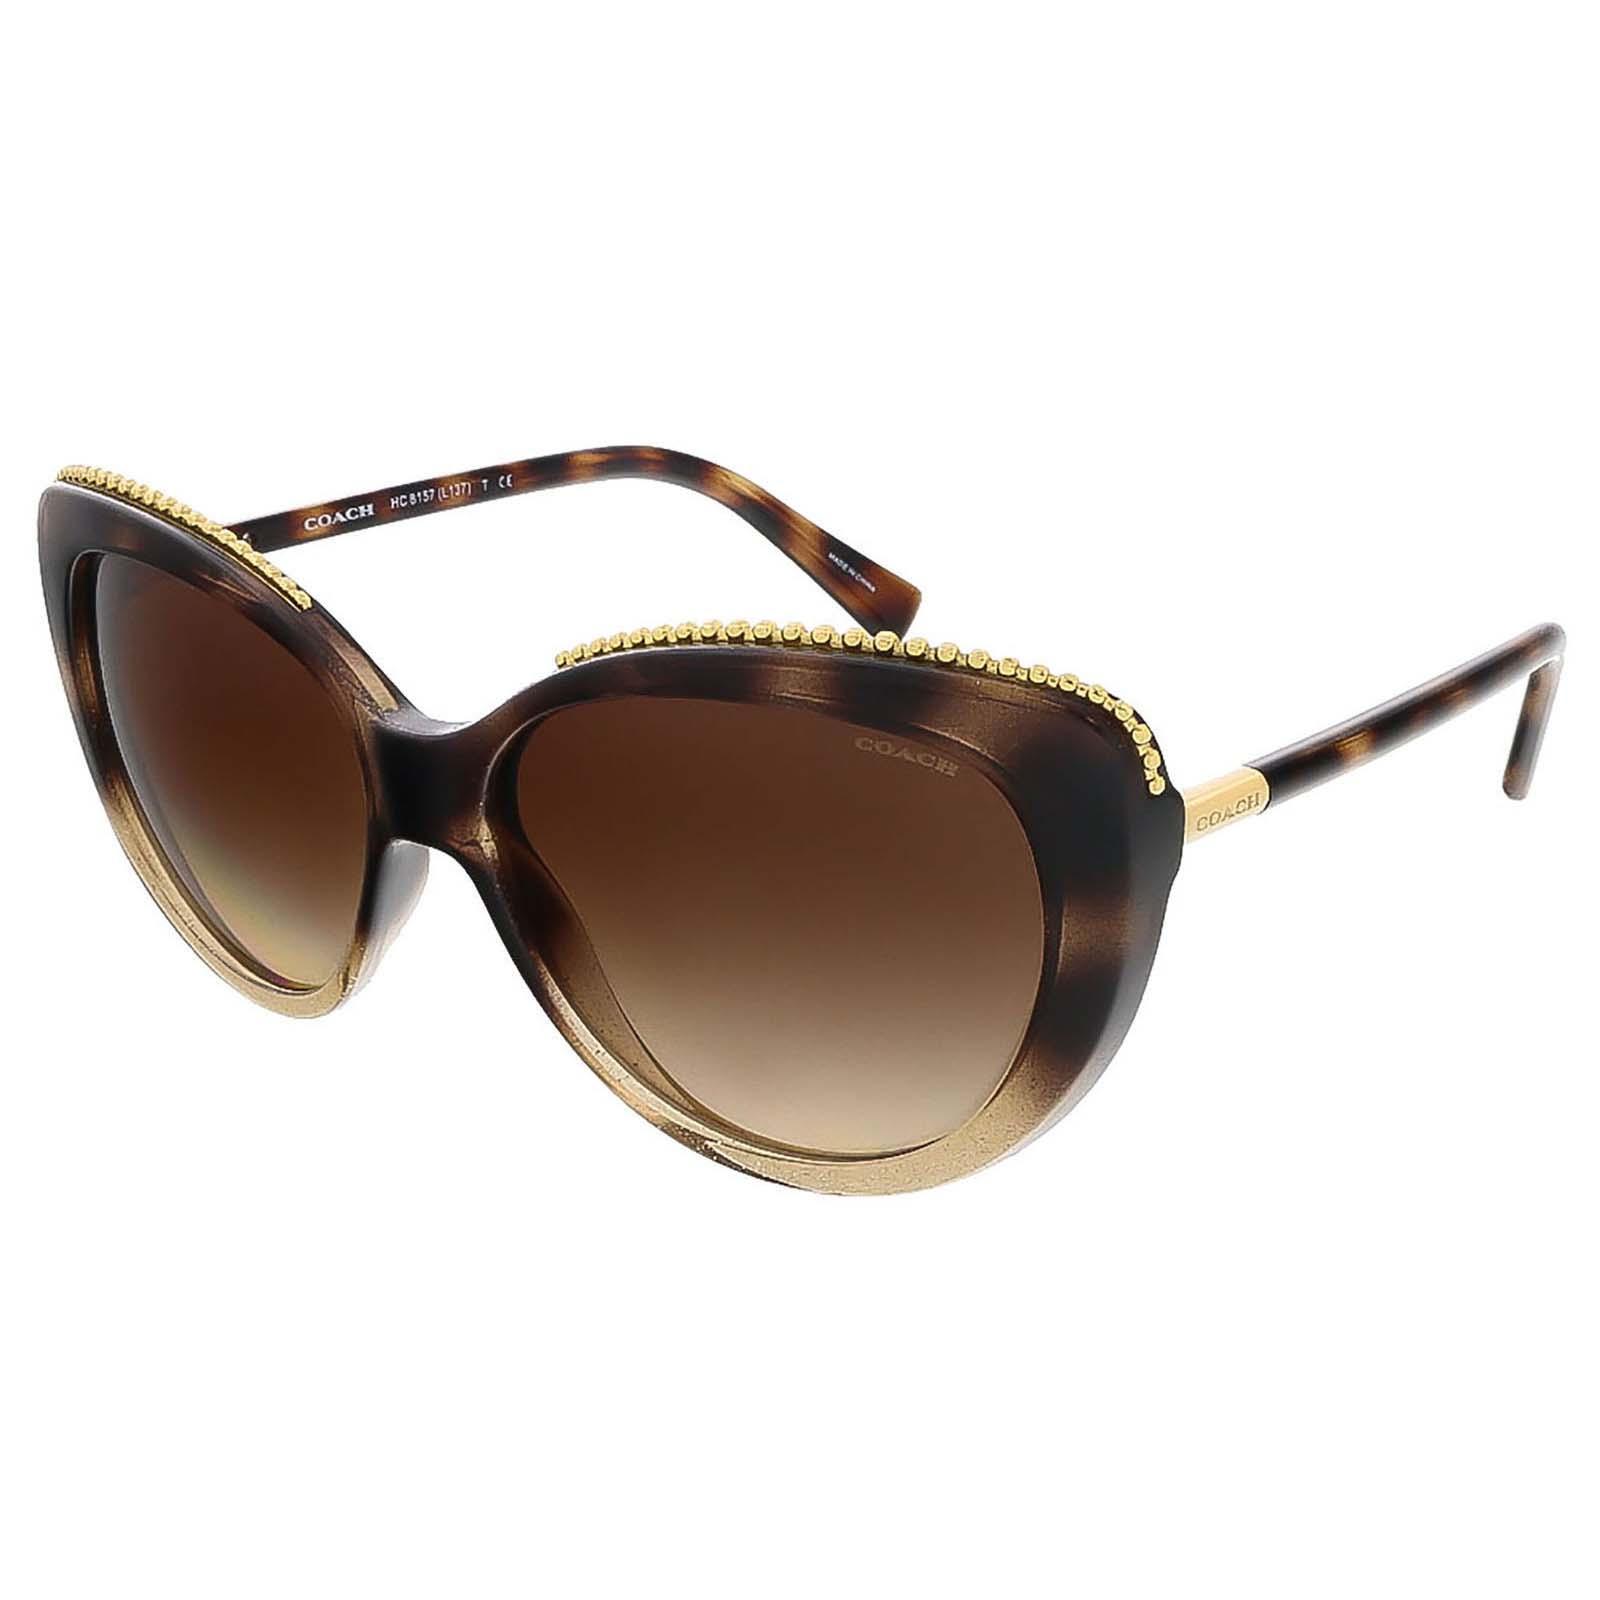 417a0f3195 Coach HC8157 533813 Glitter Dark Tortoise Cat Eye sunglasses - See ...